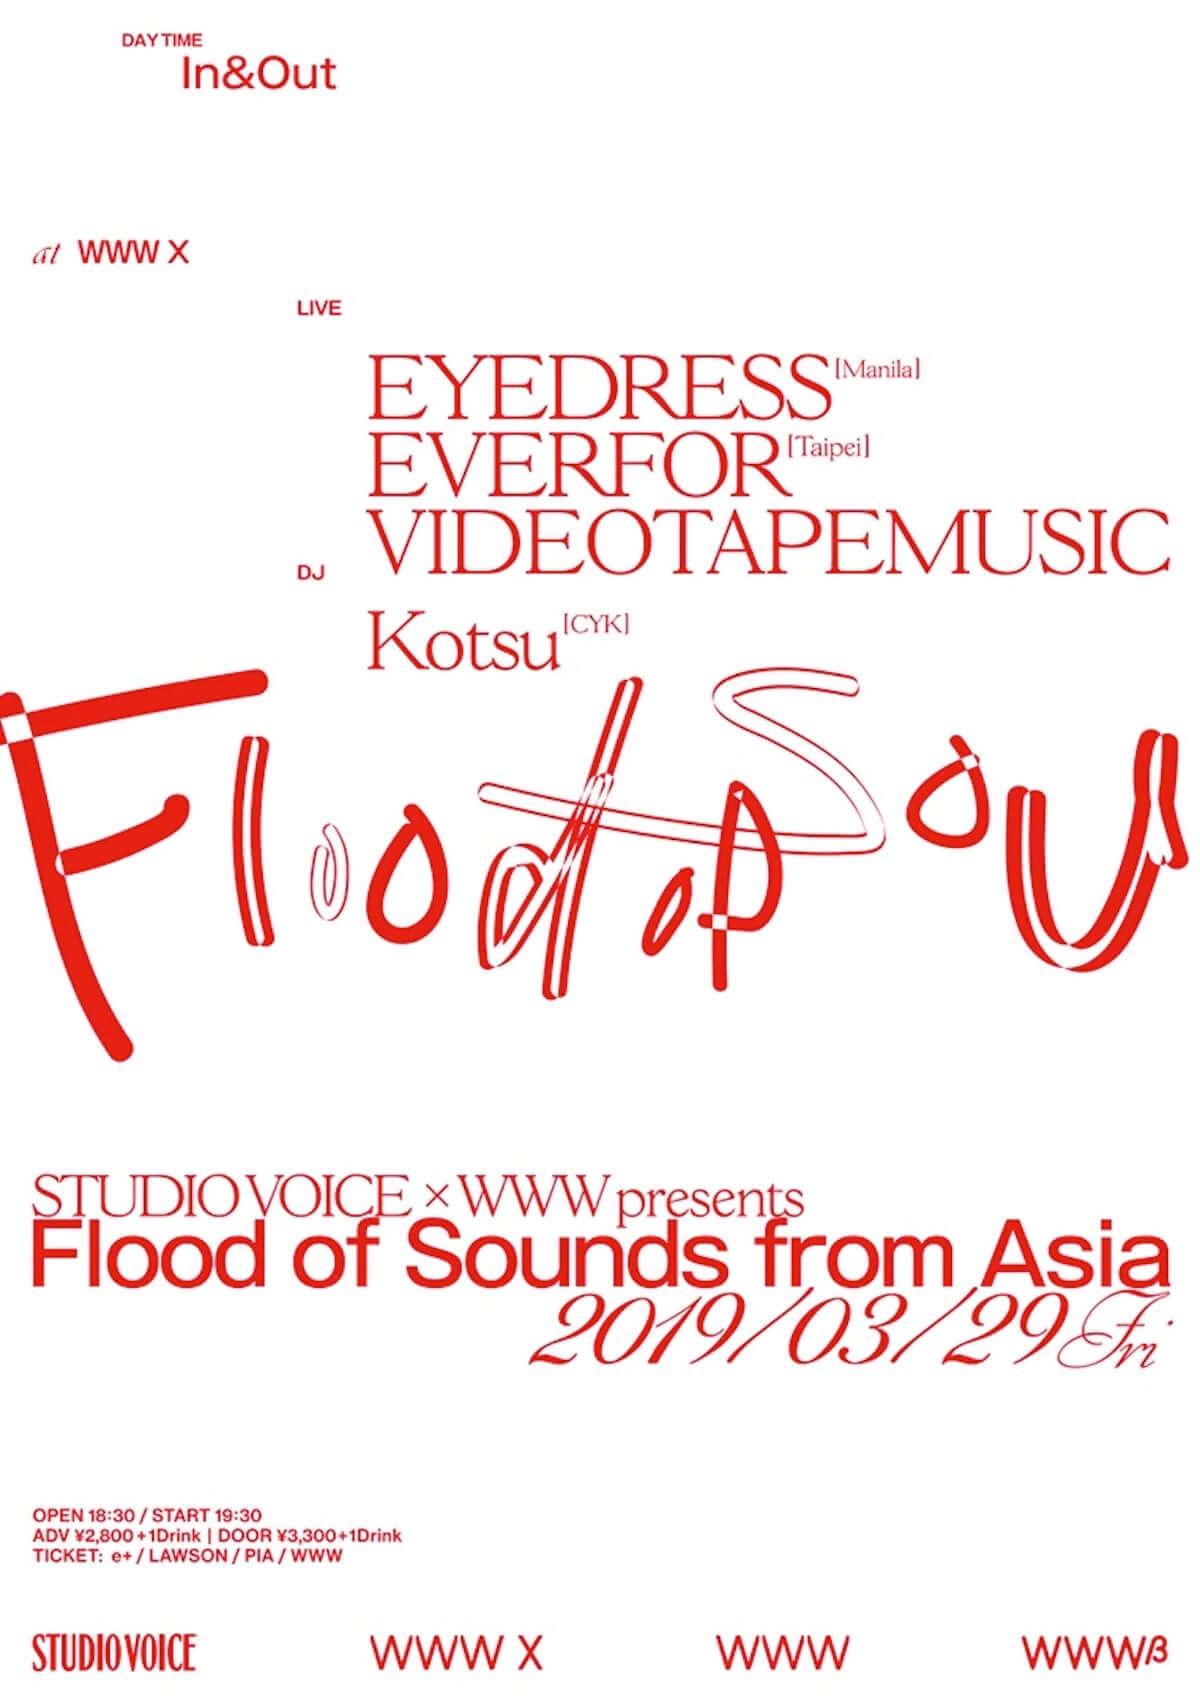 STUDIO VOICEとWWWのレギュラー企画「In&Out」と「上東」の共同イベントが開催 music190327-studio-voice-www-2-1200x1703